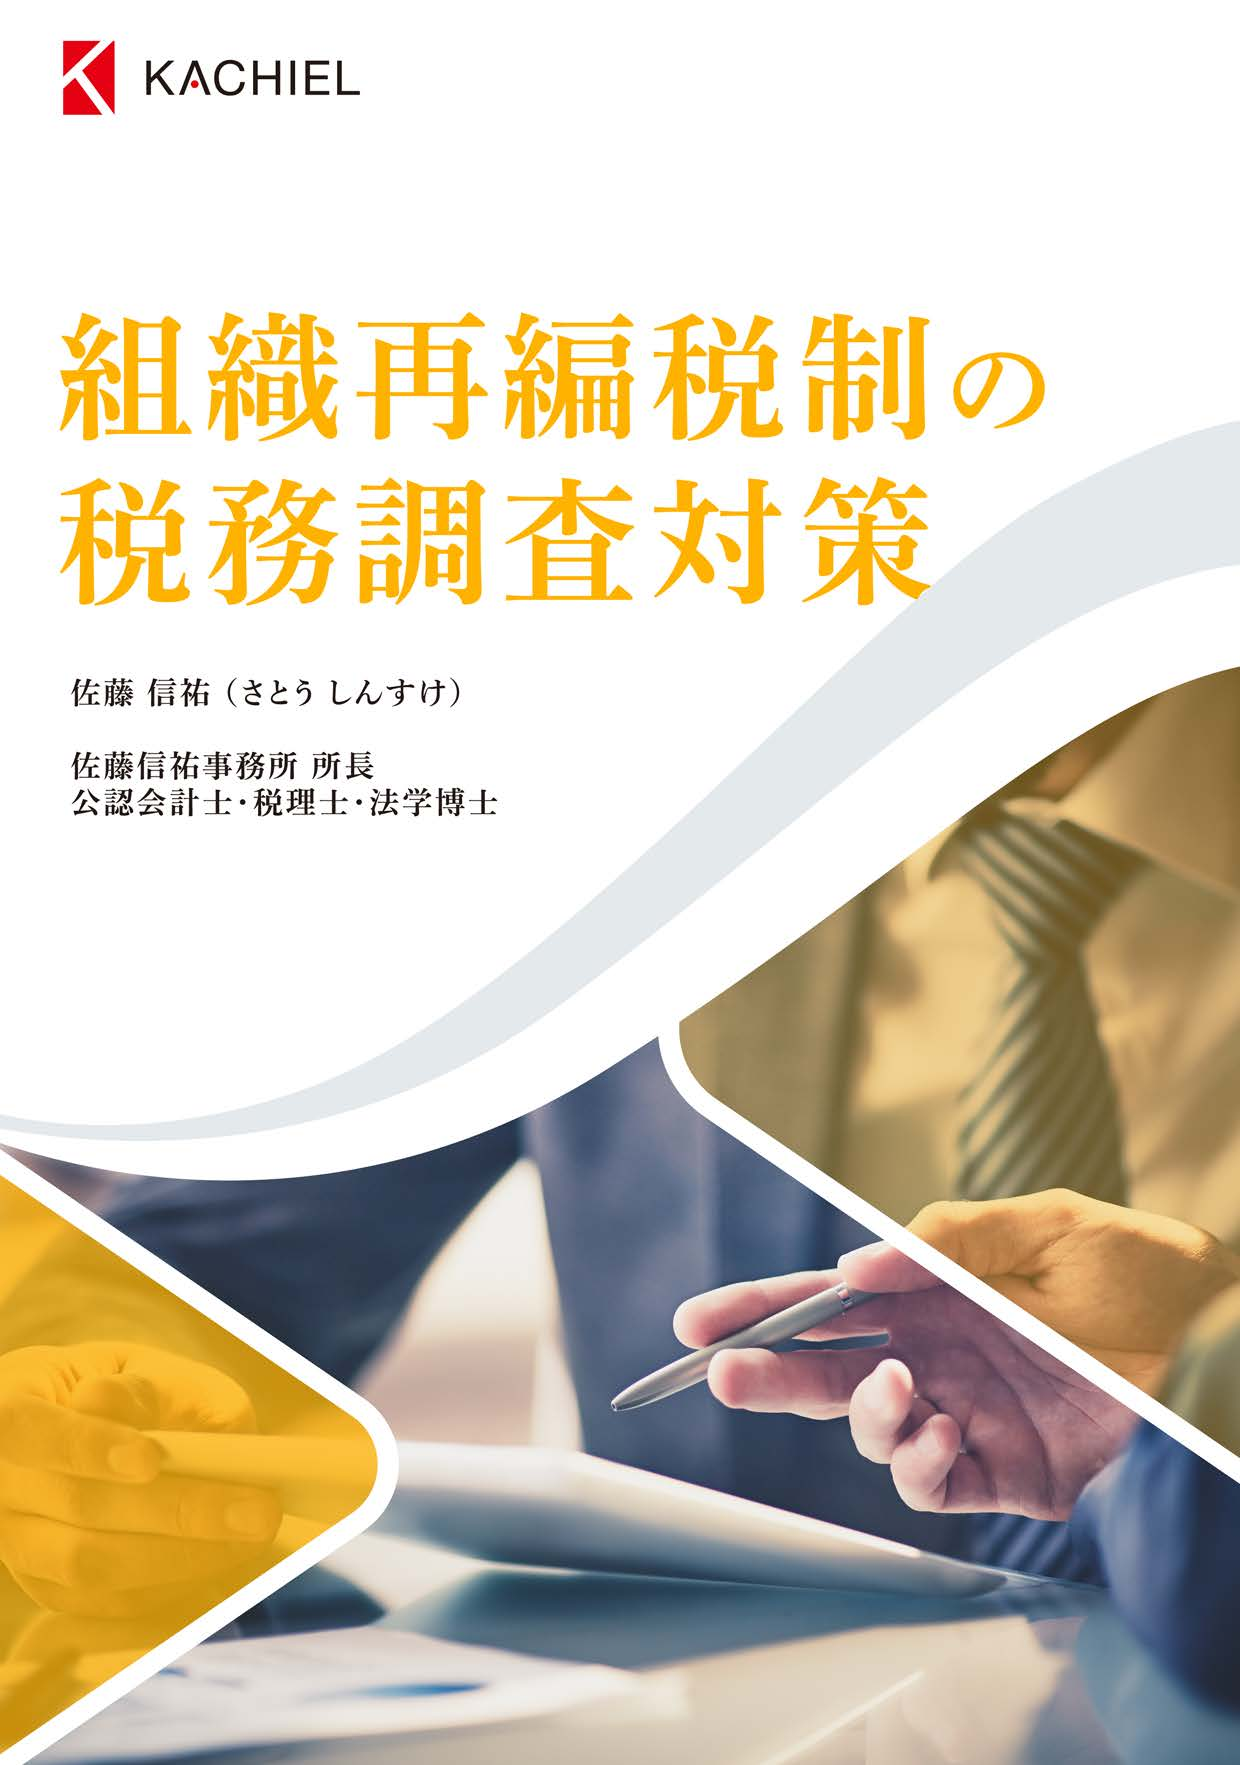 組織再編税制の税務調査対策